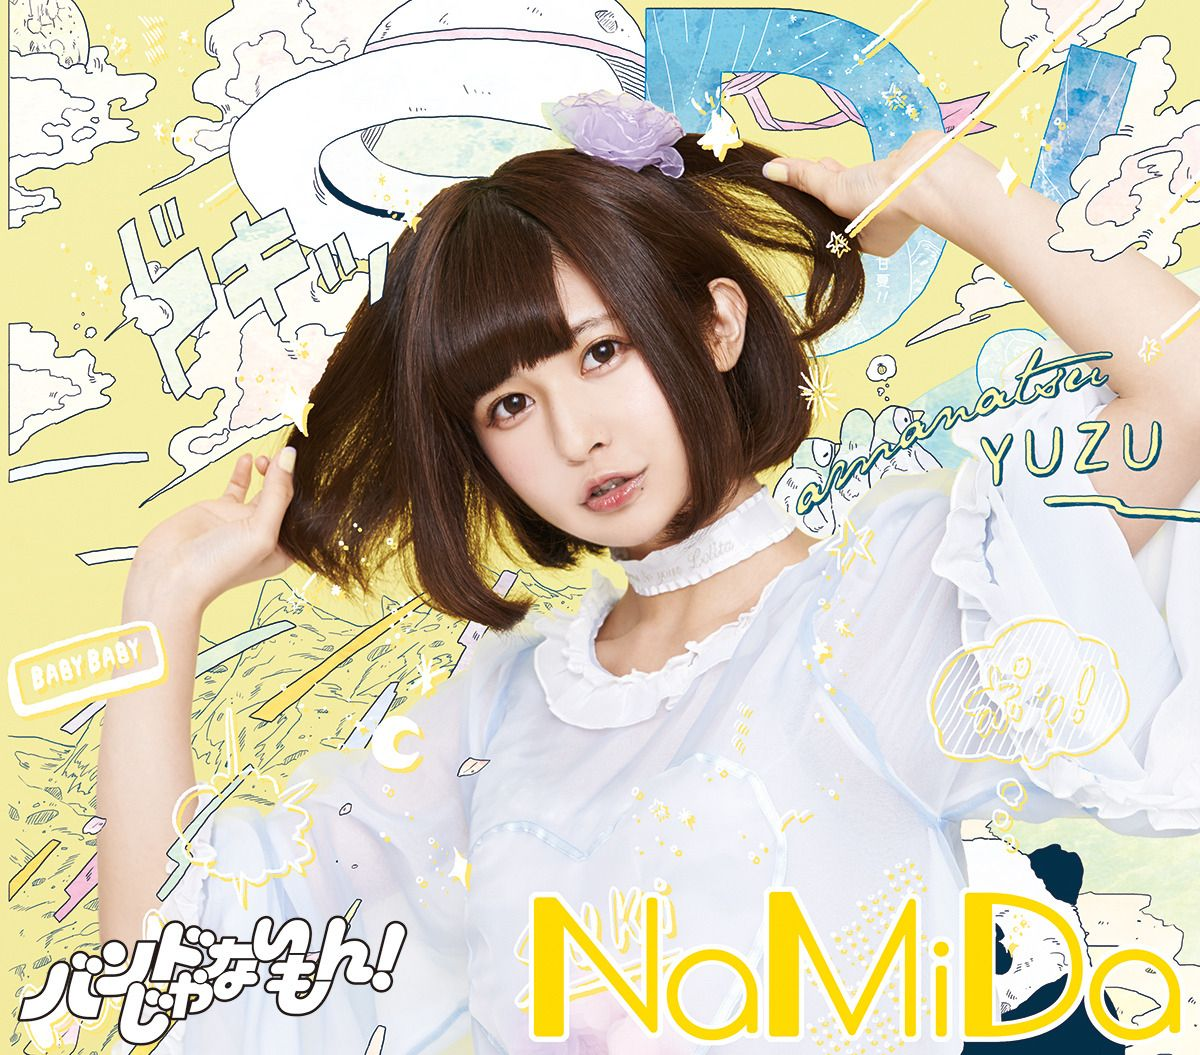 Nmd_yuzu_h1